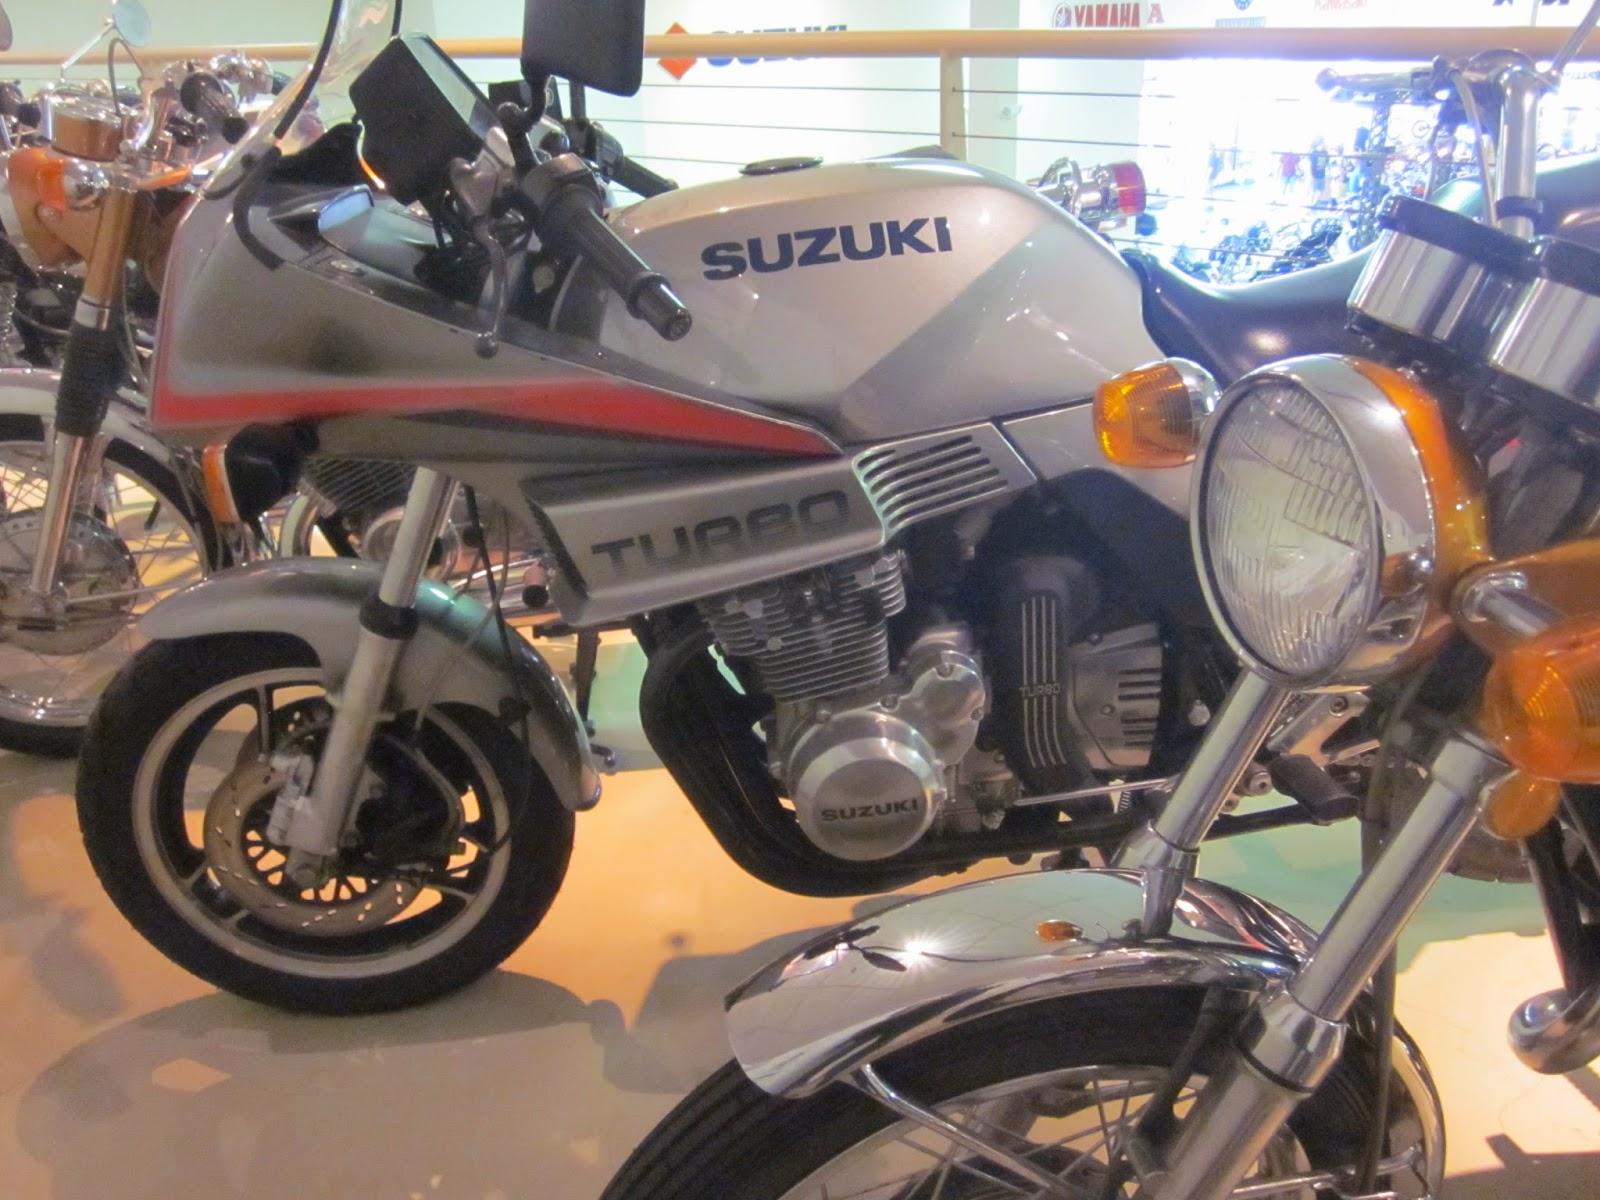 Oldmotodude suzuki xn85 turbo on display at hinshaw 39 s for Hinshaw honda auburn wa